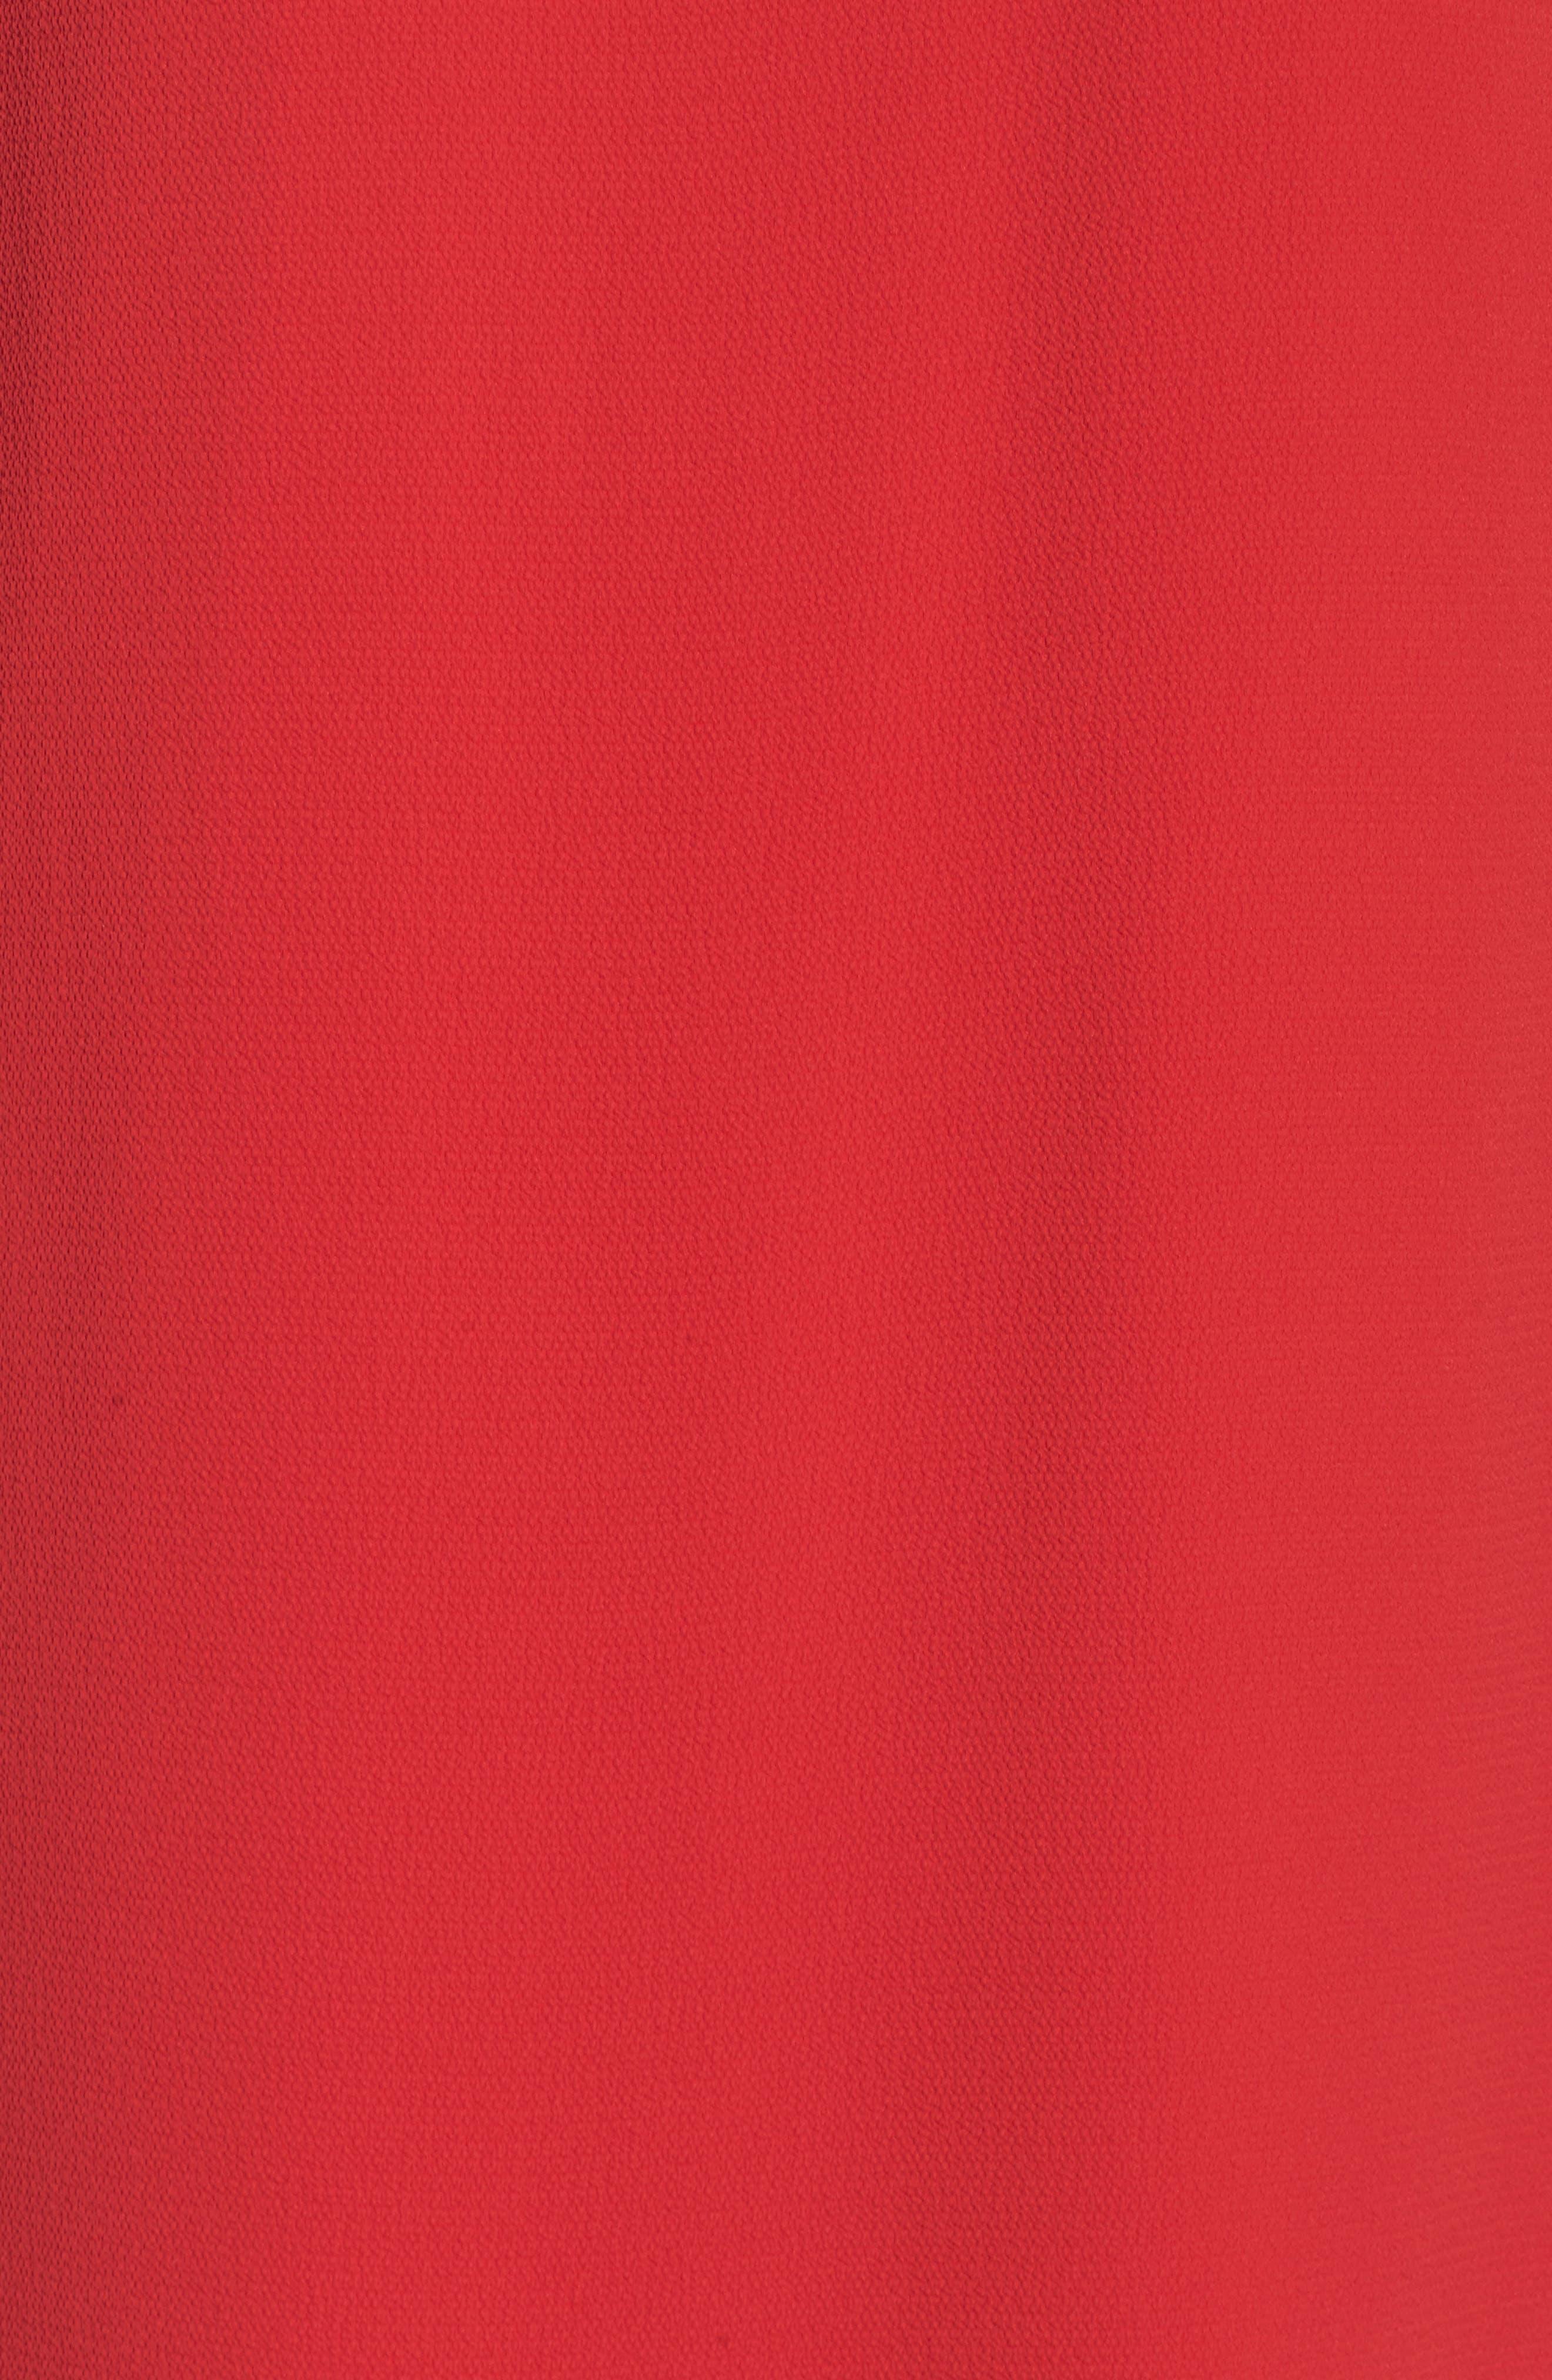 Catalina Ruffle Sleeve Dress,                             Alternate thumbnail 5, color,                             648